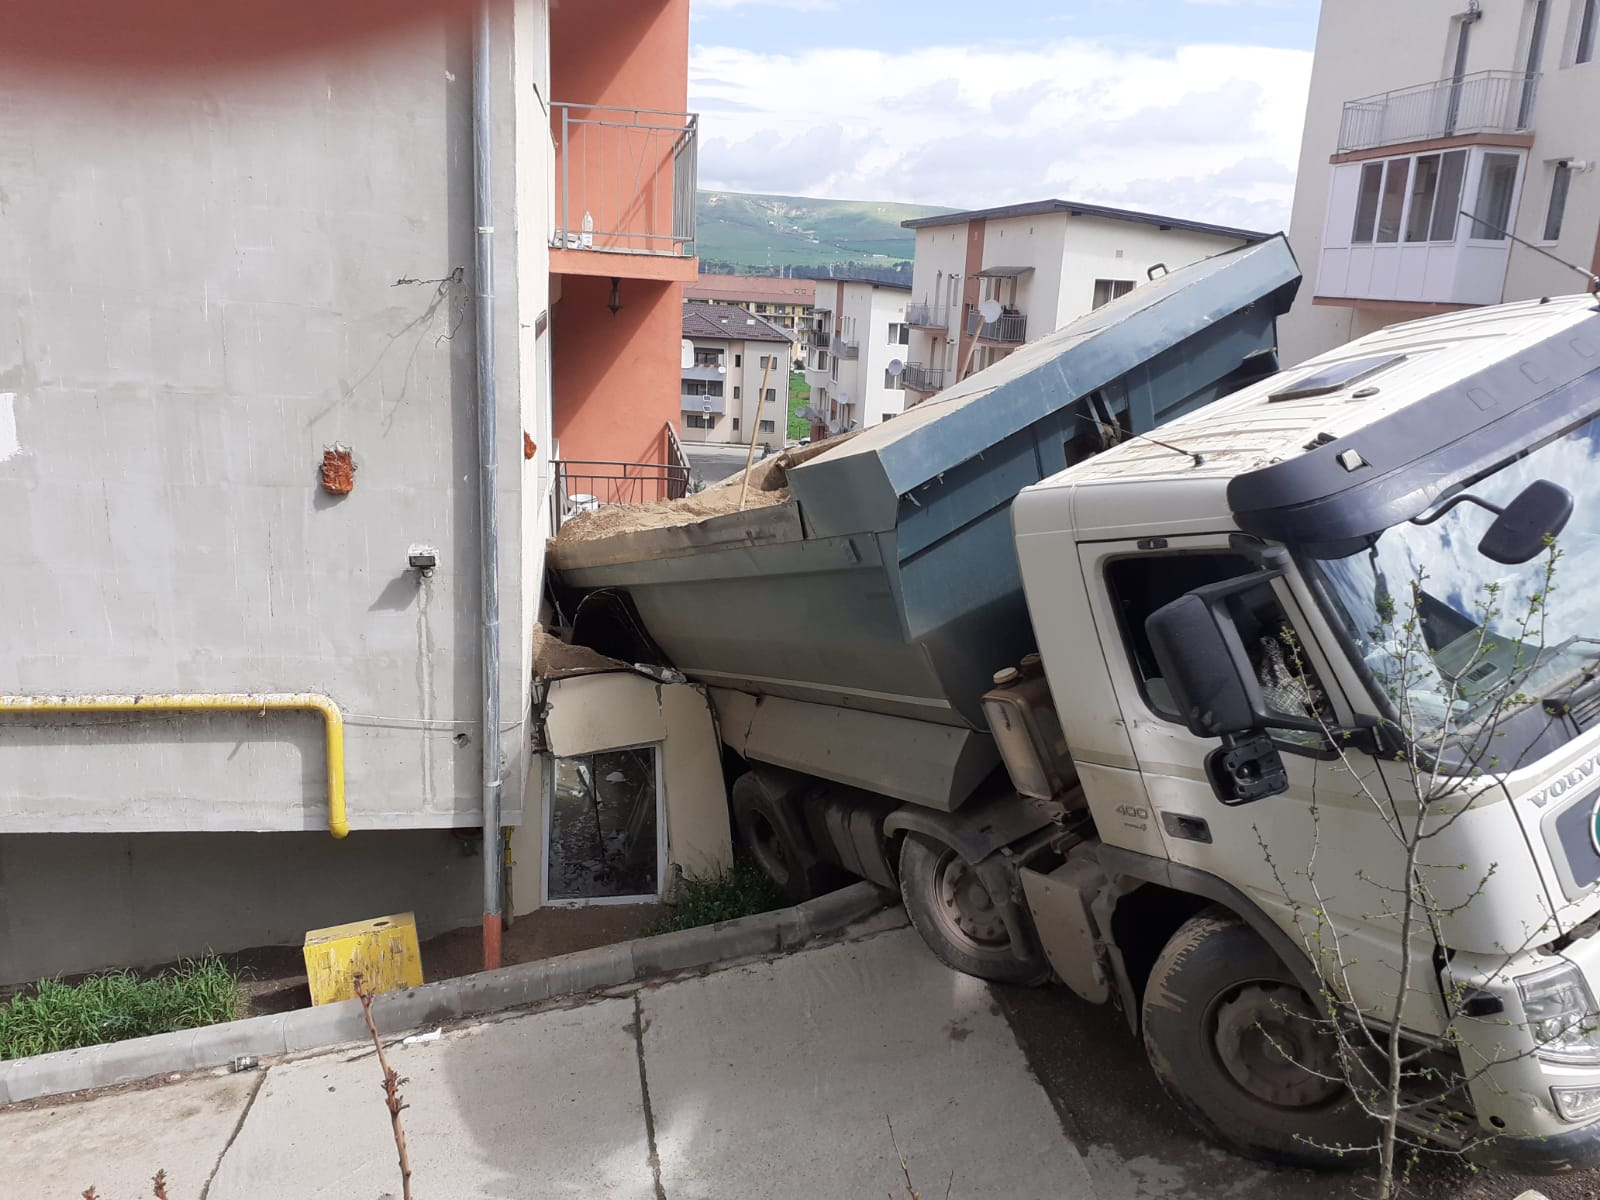 O basculanta cu nisip s-a rasturnat peste balconul unui apartament aflat la parter intr-o localitate din judetul Cluj. FOTO